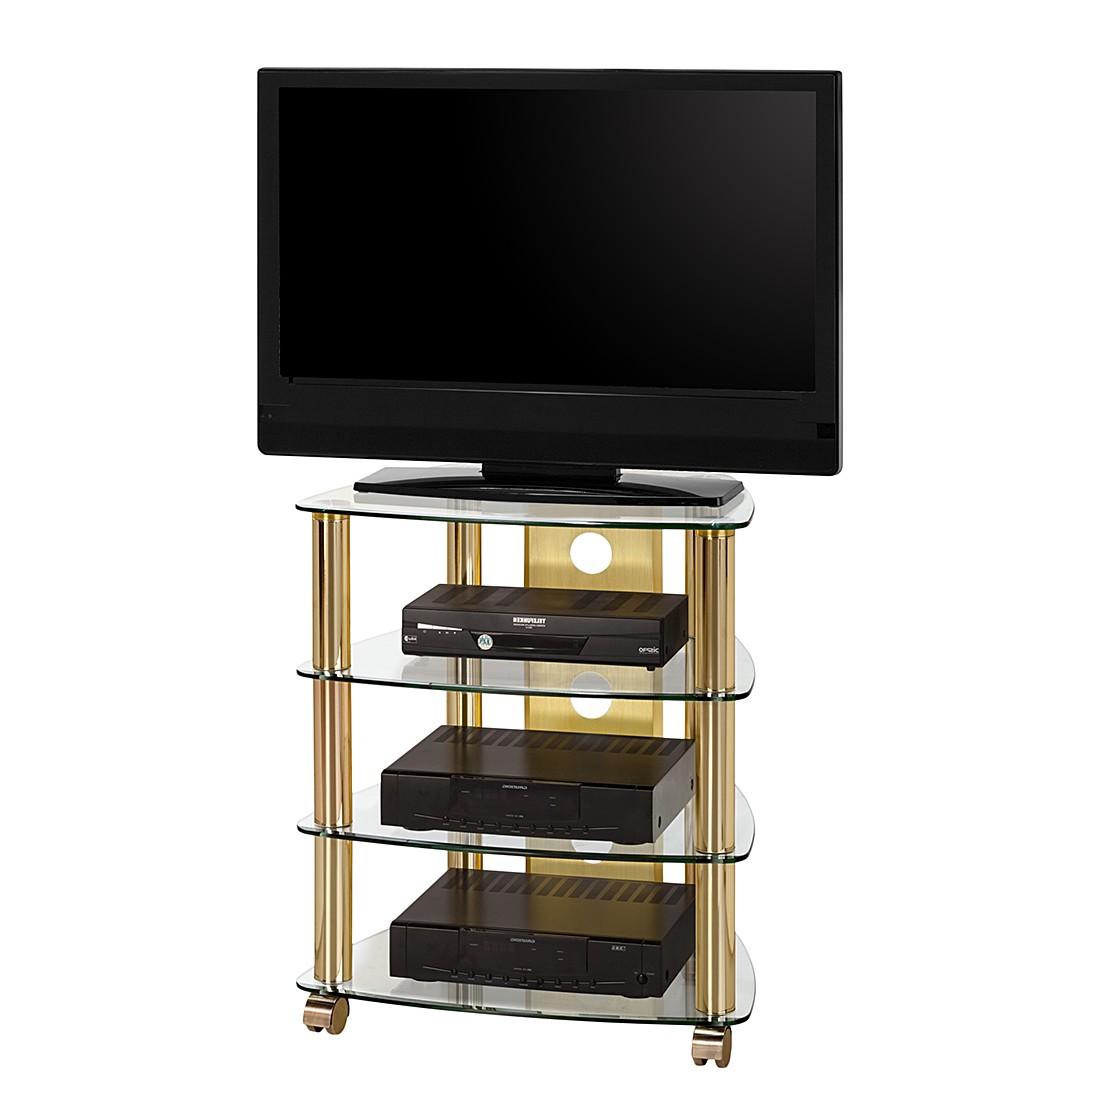 lampada esternointerno ottone lucidocromata prix et meilleures offres. Black Bedroom Furniture Sets. Home Design Ideas